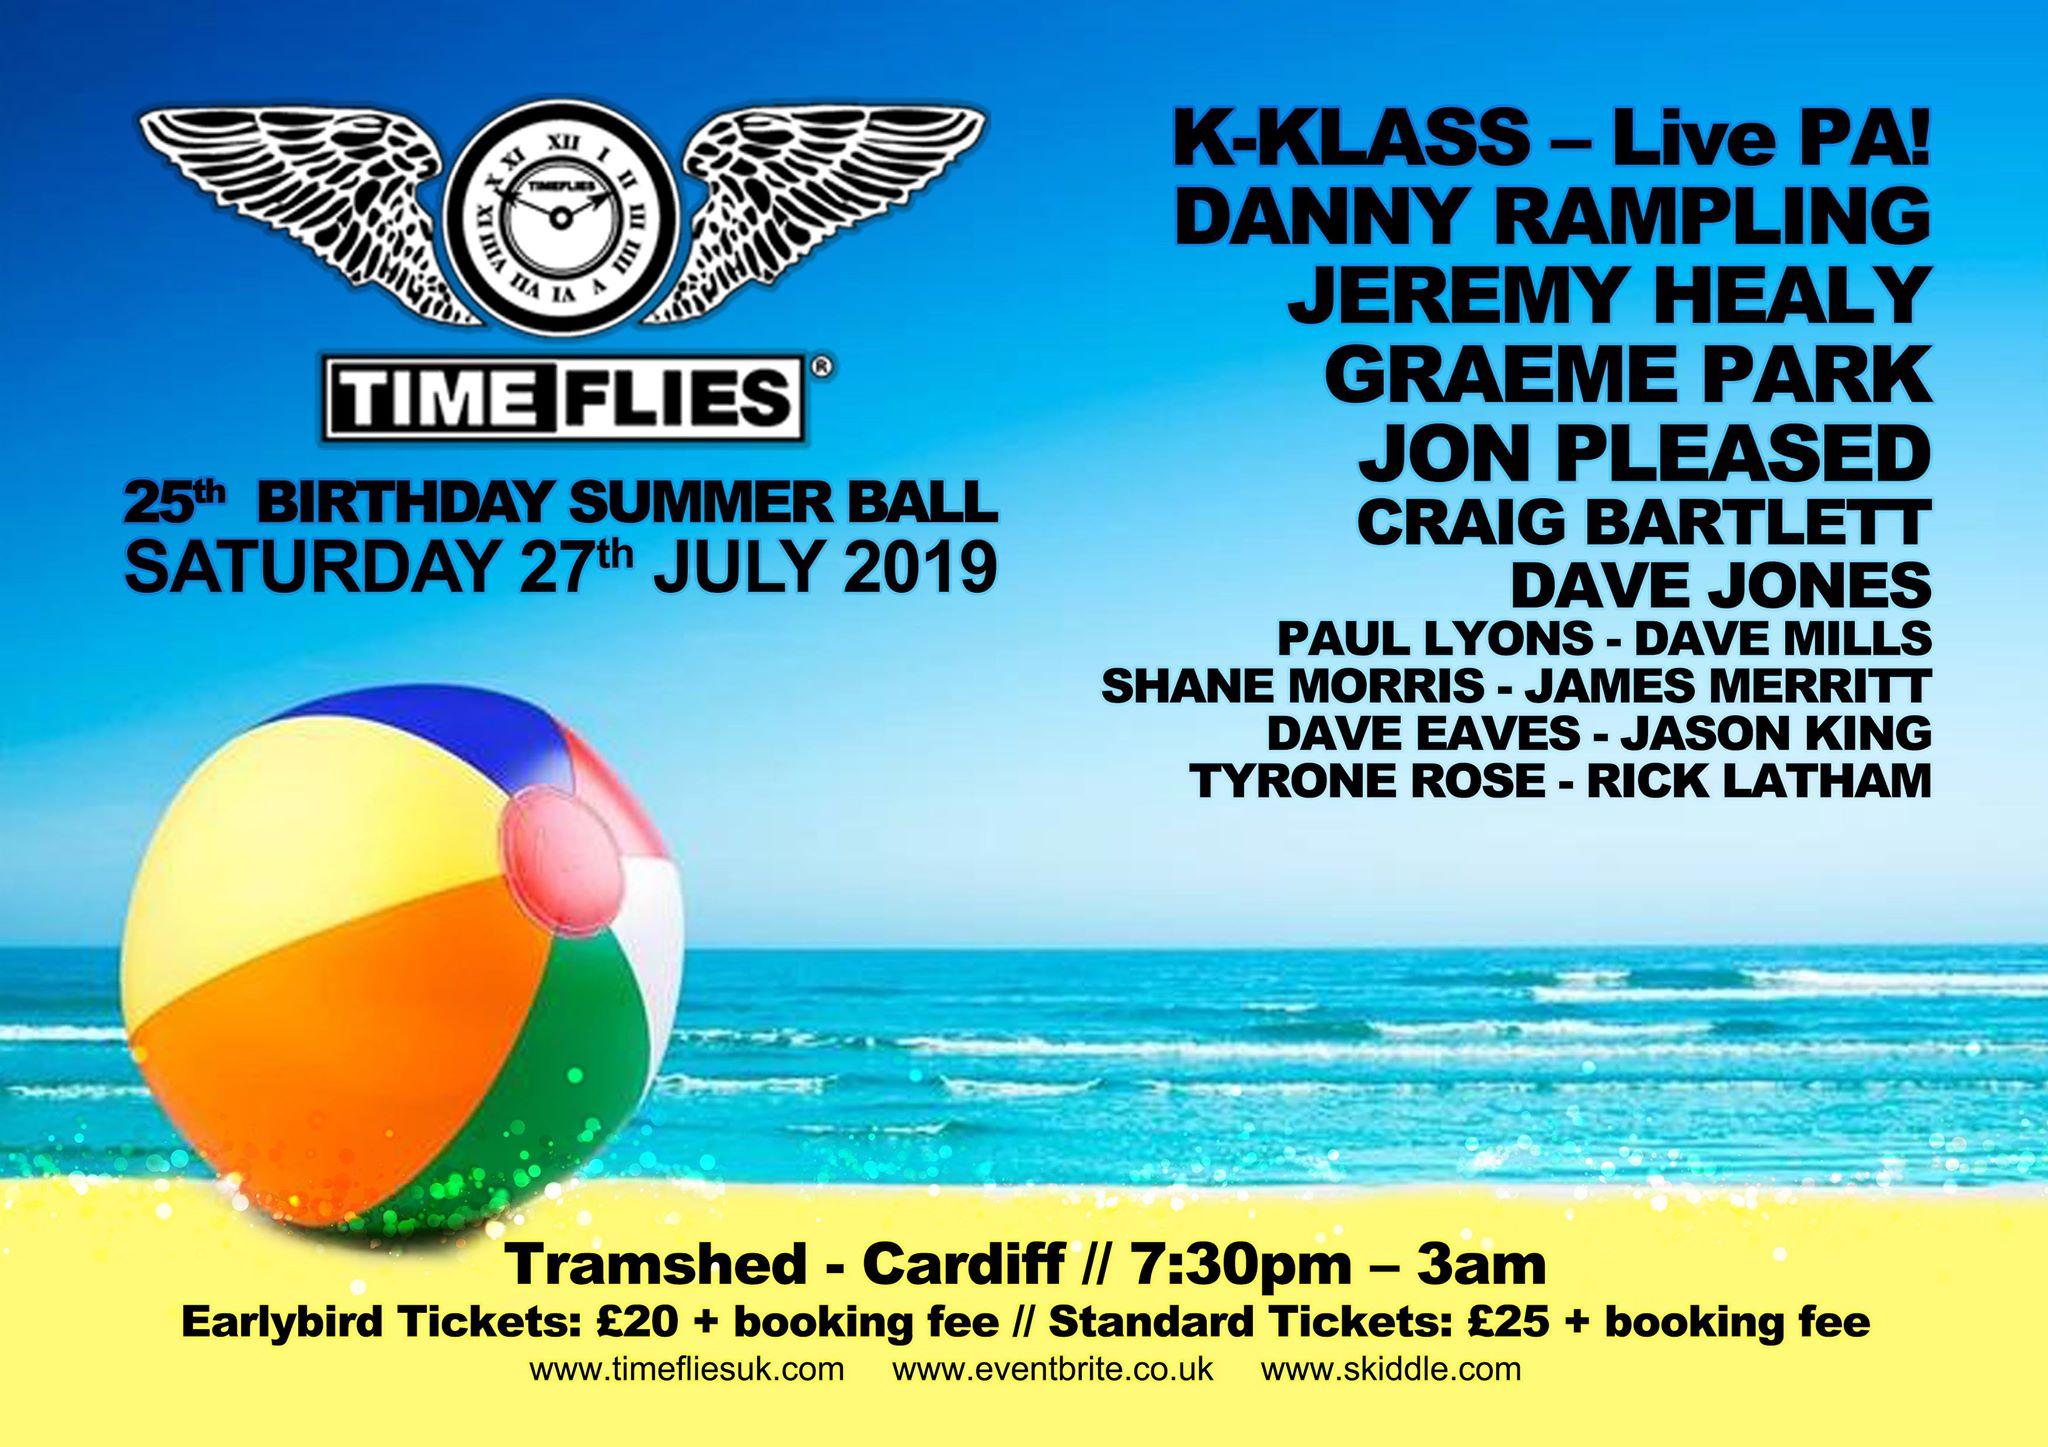 Time Flies 25th Birthday Summer Ball